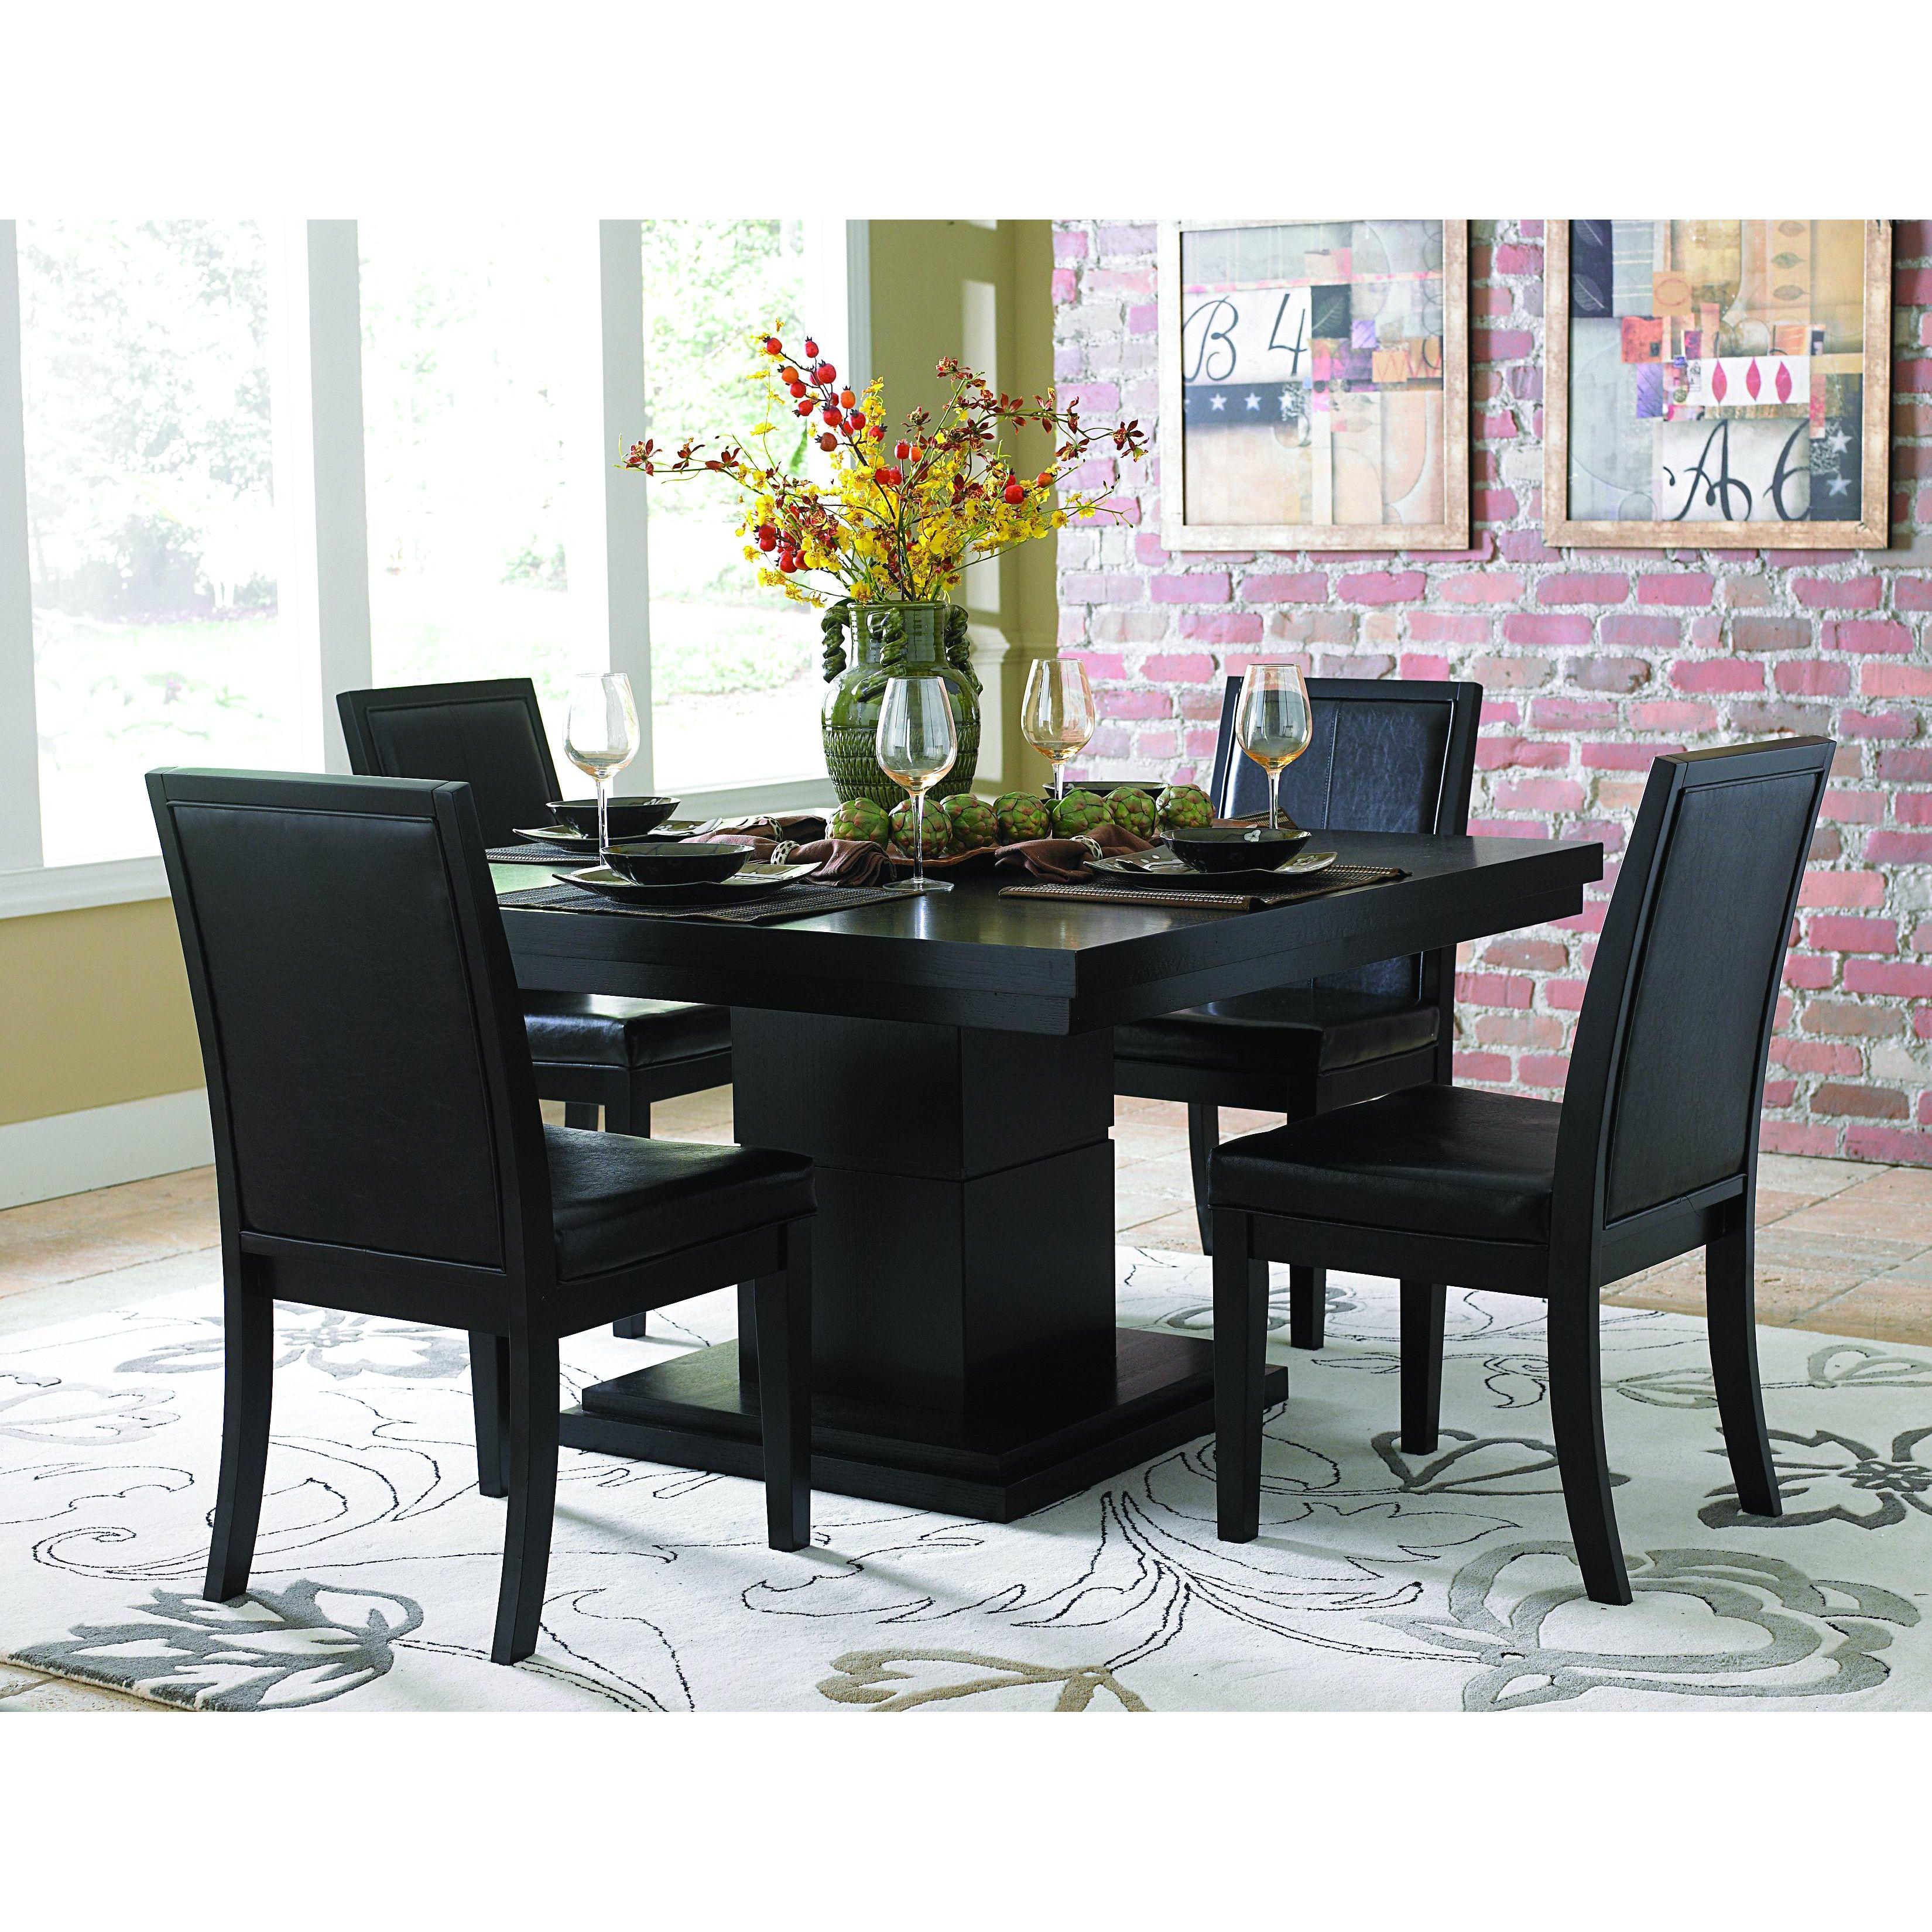 Brayden studio claypool dining table black dining room